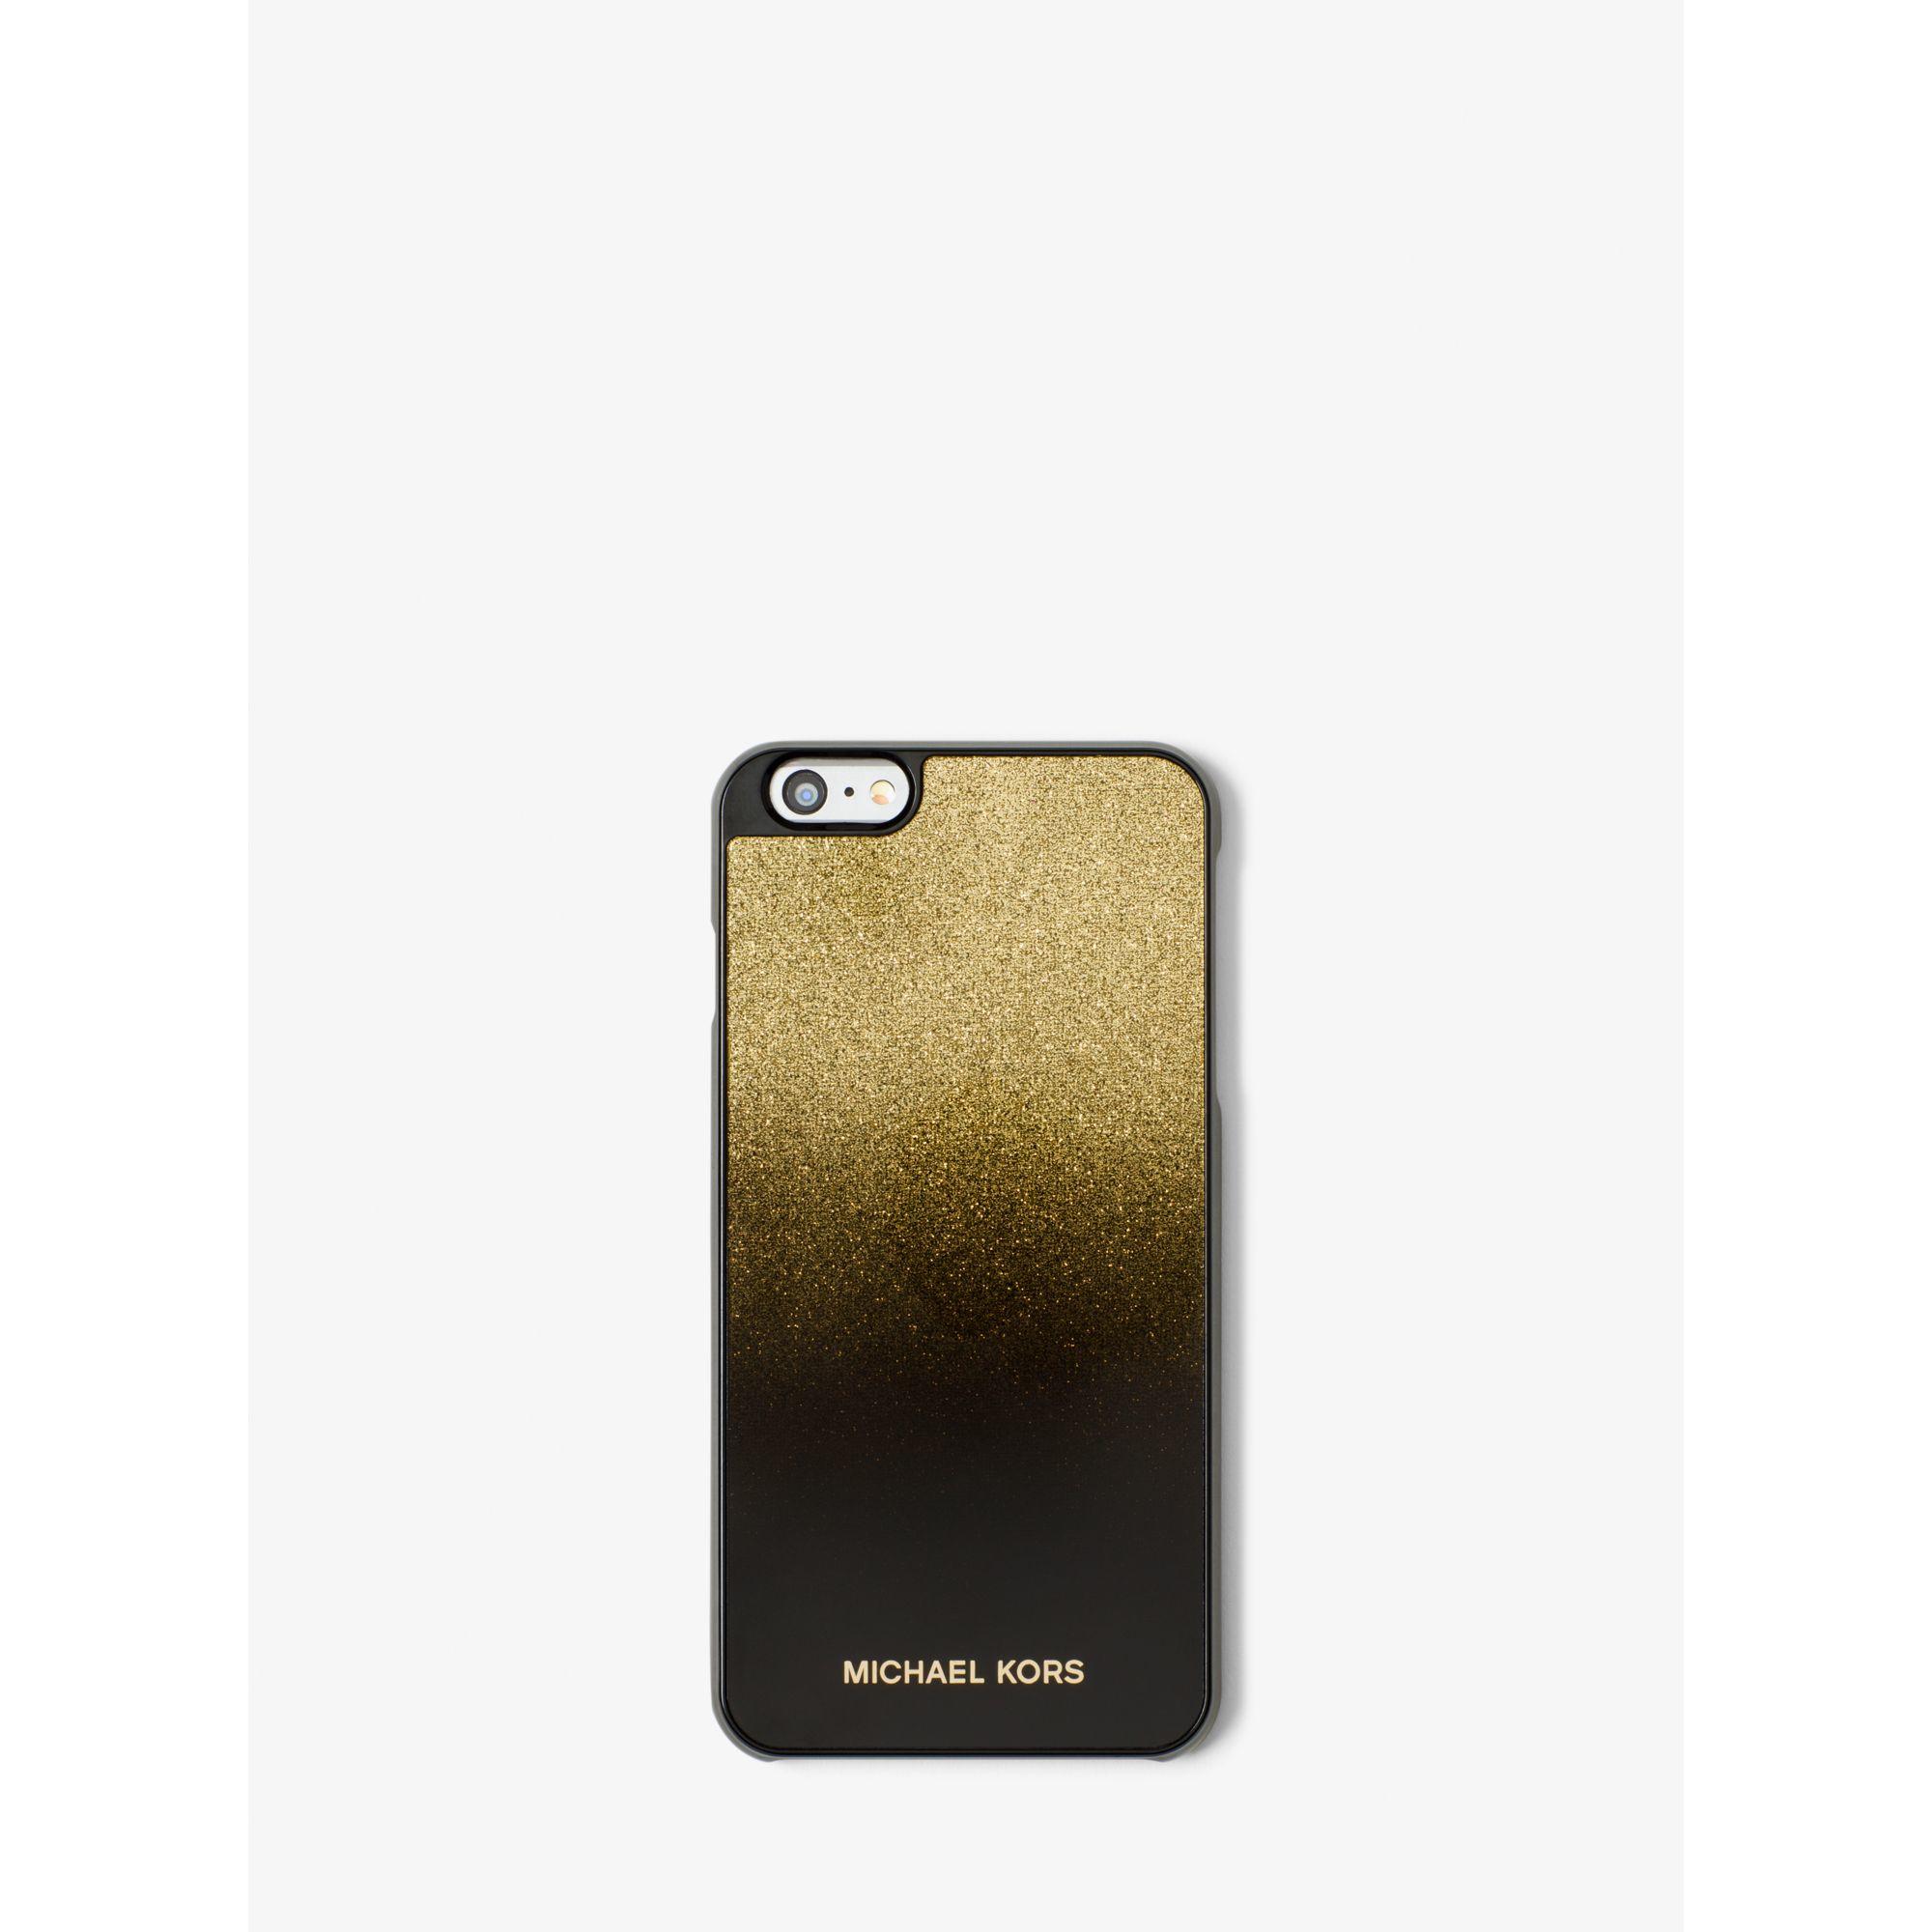 michael kors metallic ombr phone case for iphone 6 plus 6s plus in. Black Bedroom Furniture Sets. Home Design Ideas